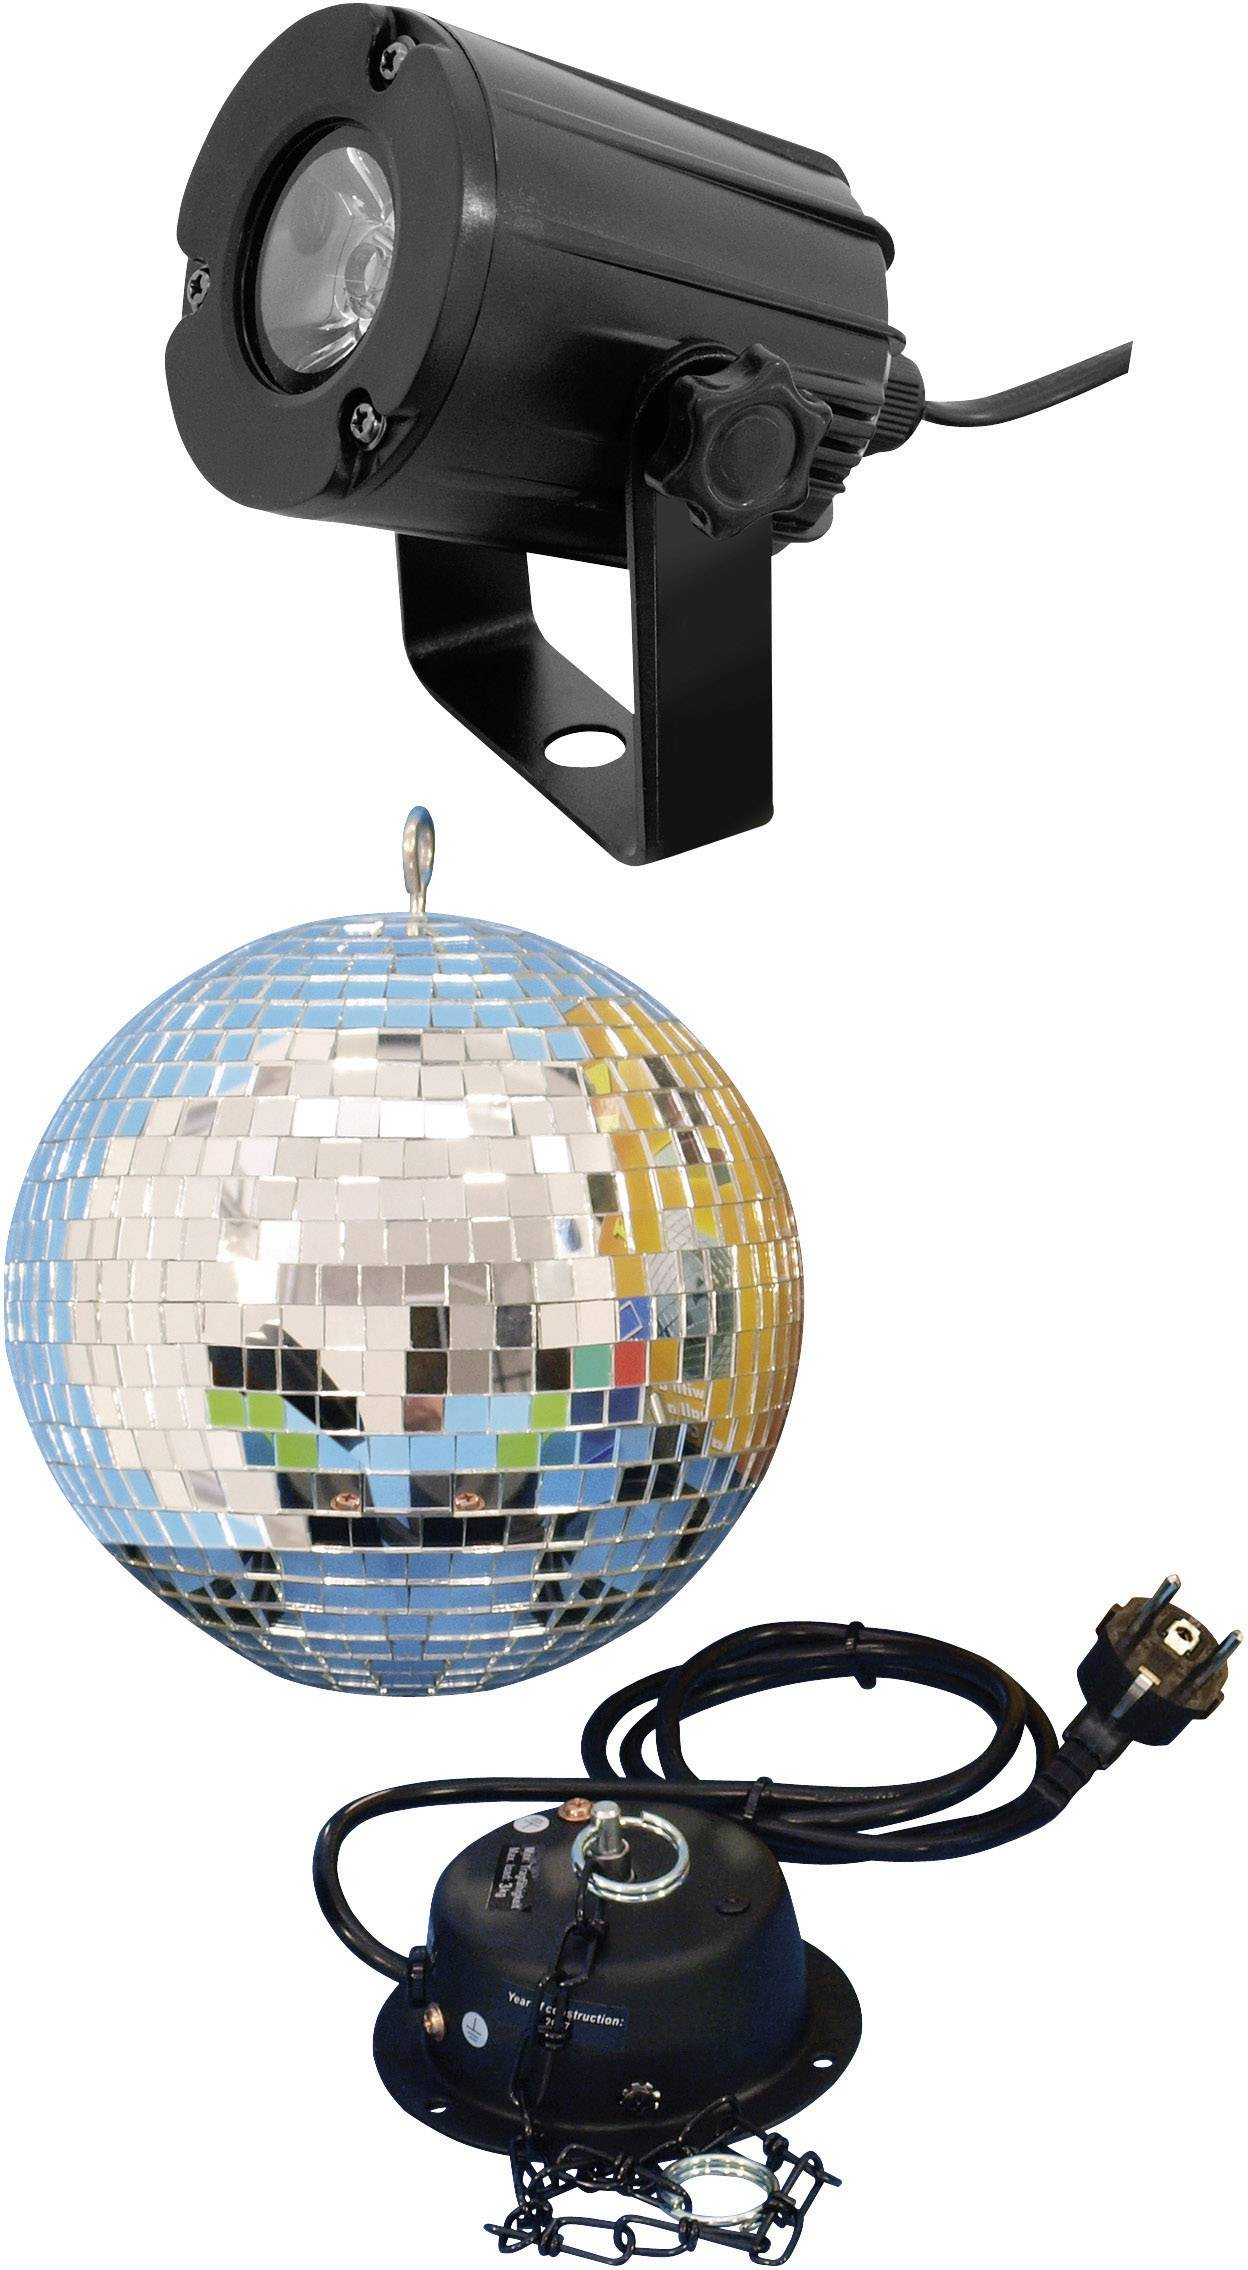 Eurolite 50101856 LED Spiegelbolset met LED-verlichting, Met motor ...